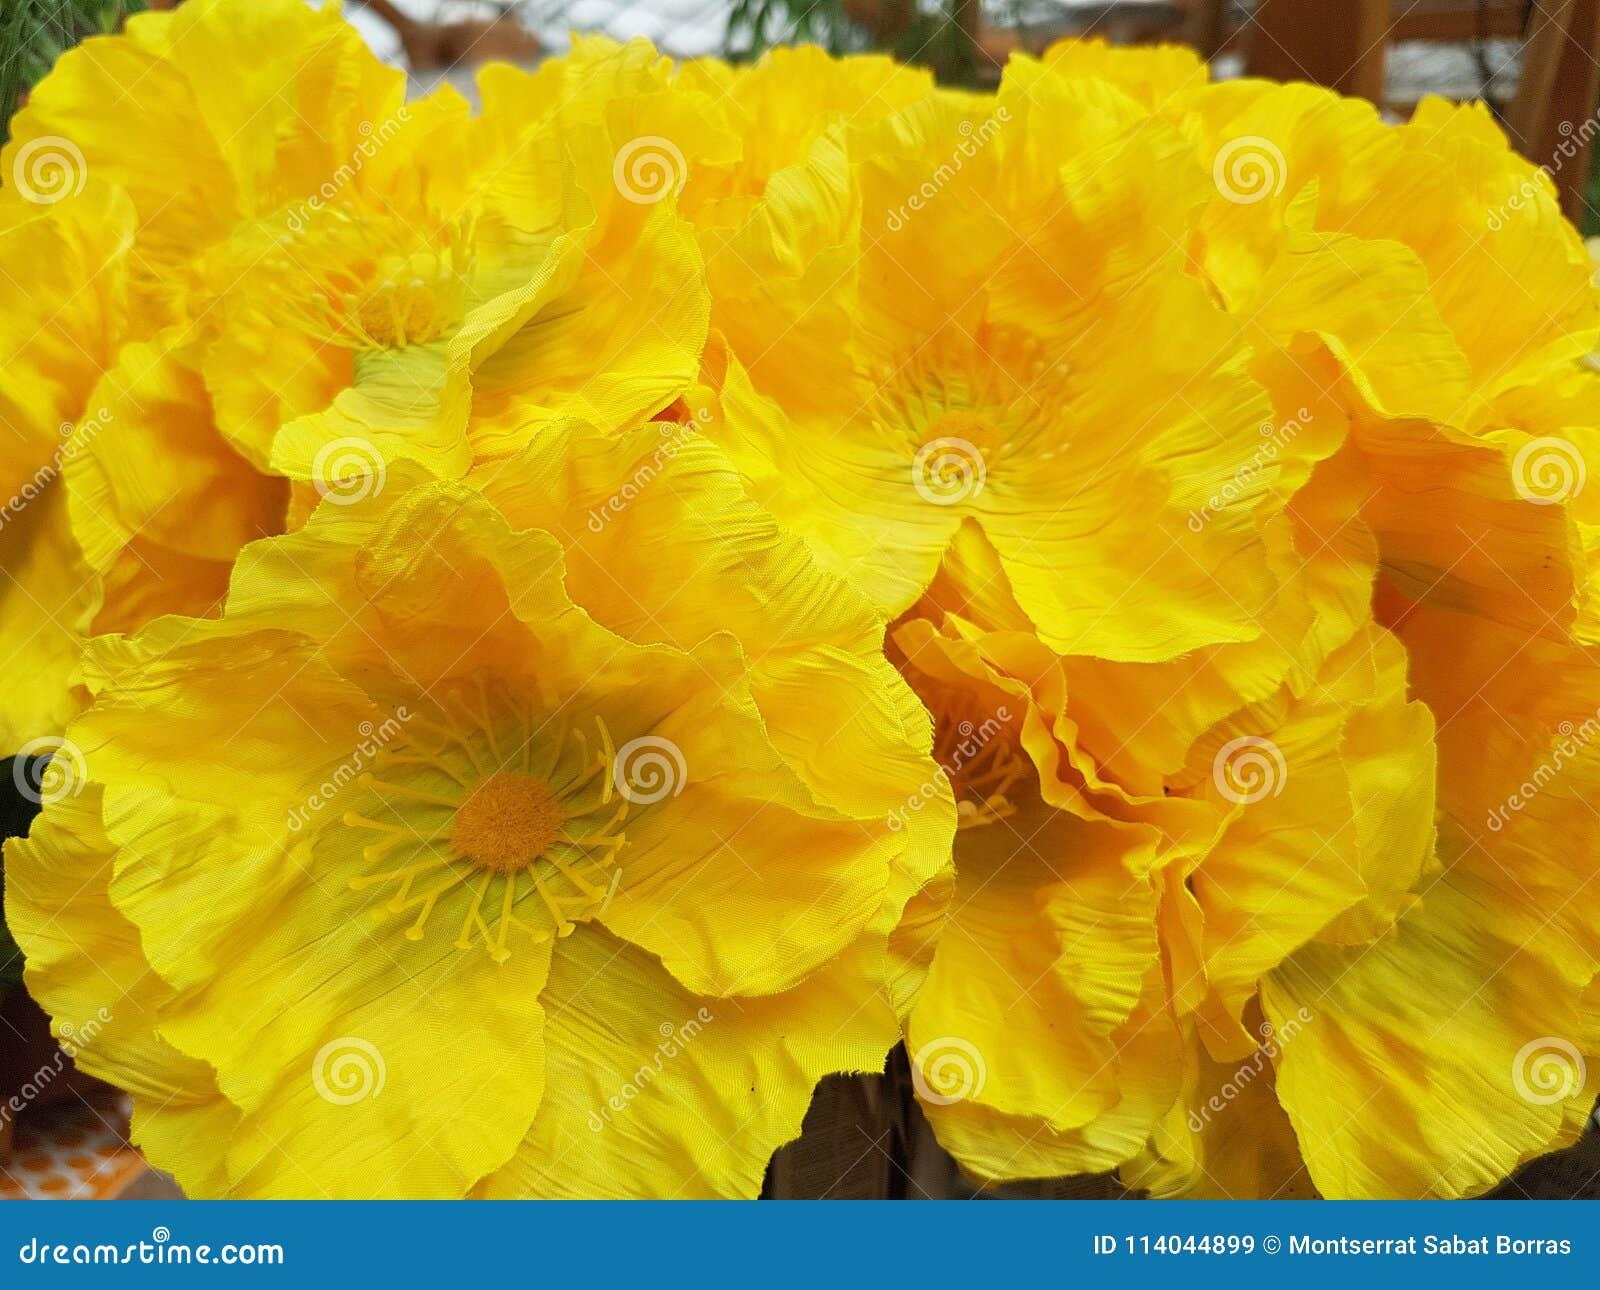 Yellow plastic poppy flowers stock image image of pansy yellow plastic poppy flowers mightylinksfo